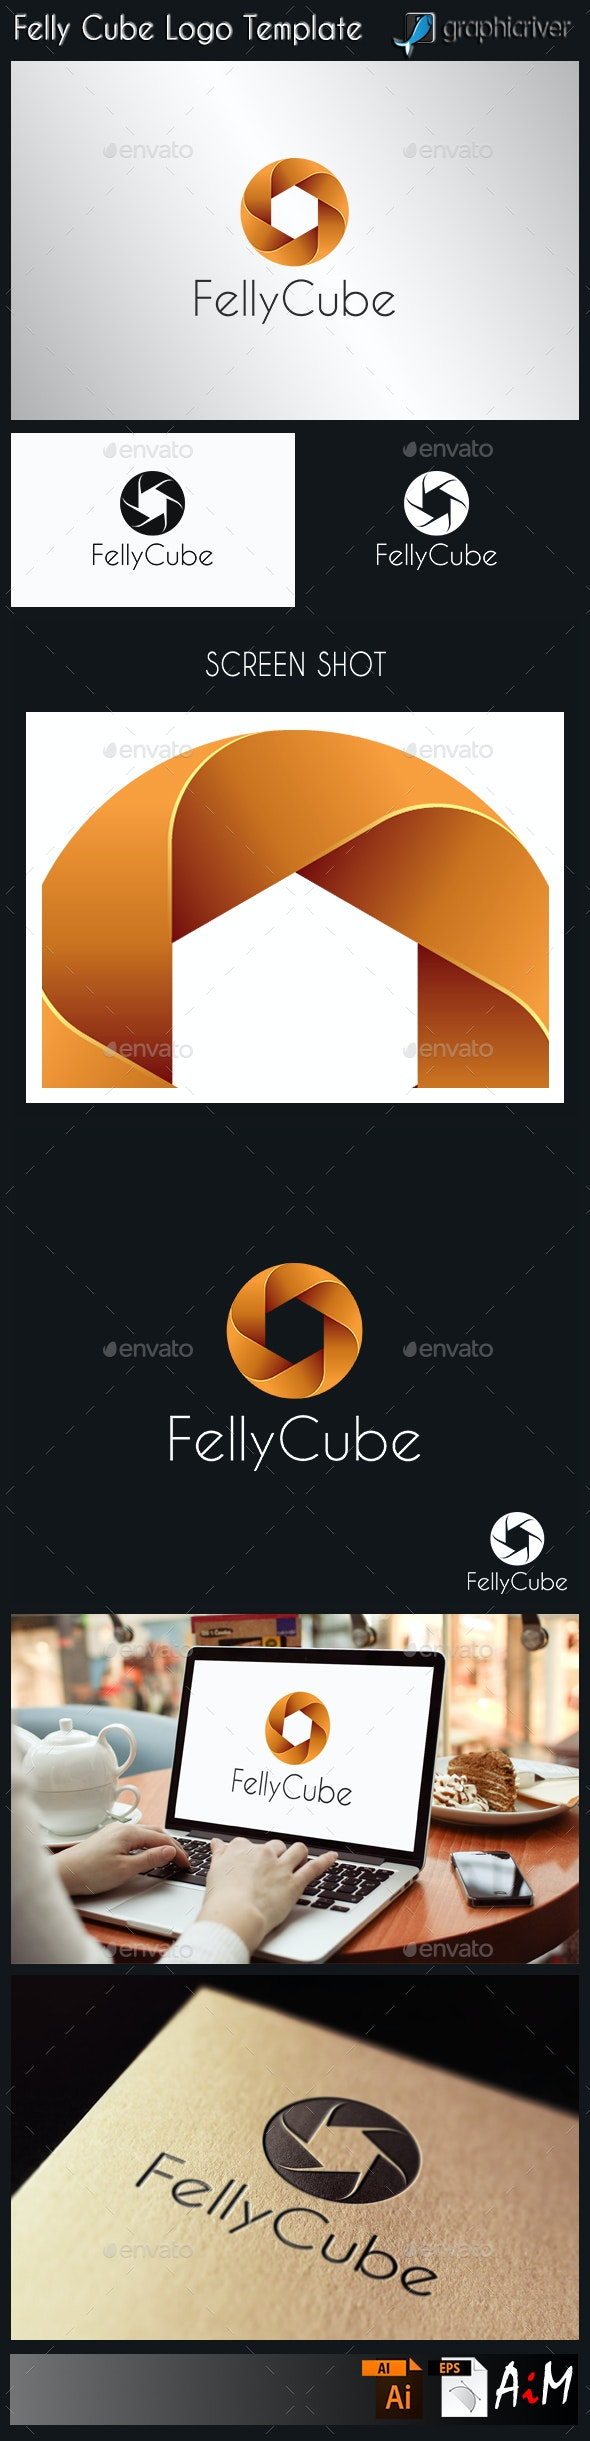 Felly Cube - Circle Logo - Abstract Logo Templates